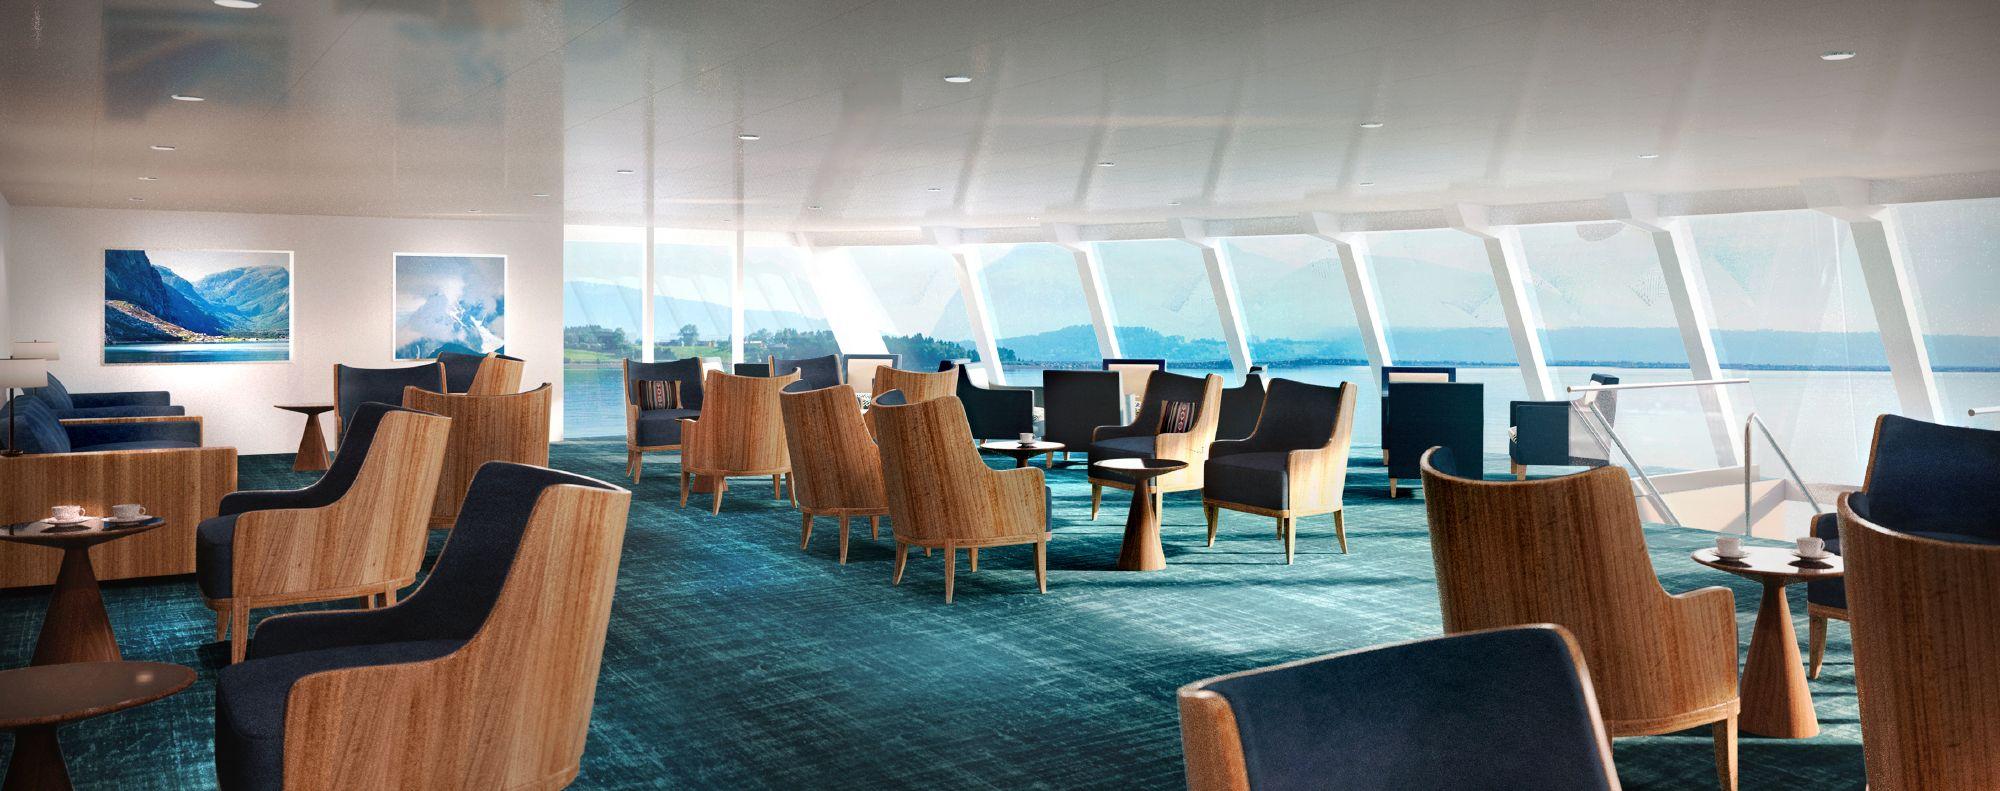 Hurtigruten MS Spitsbergen Interior Lounge.jpg